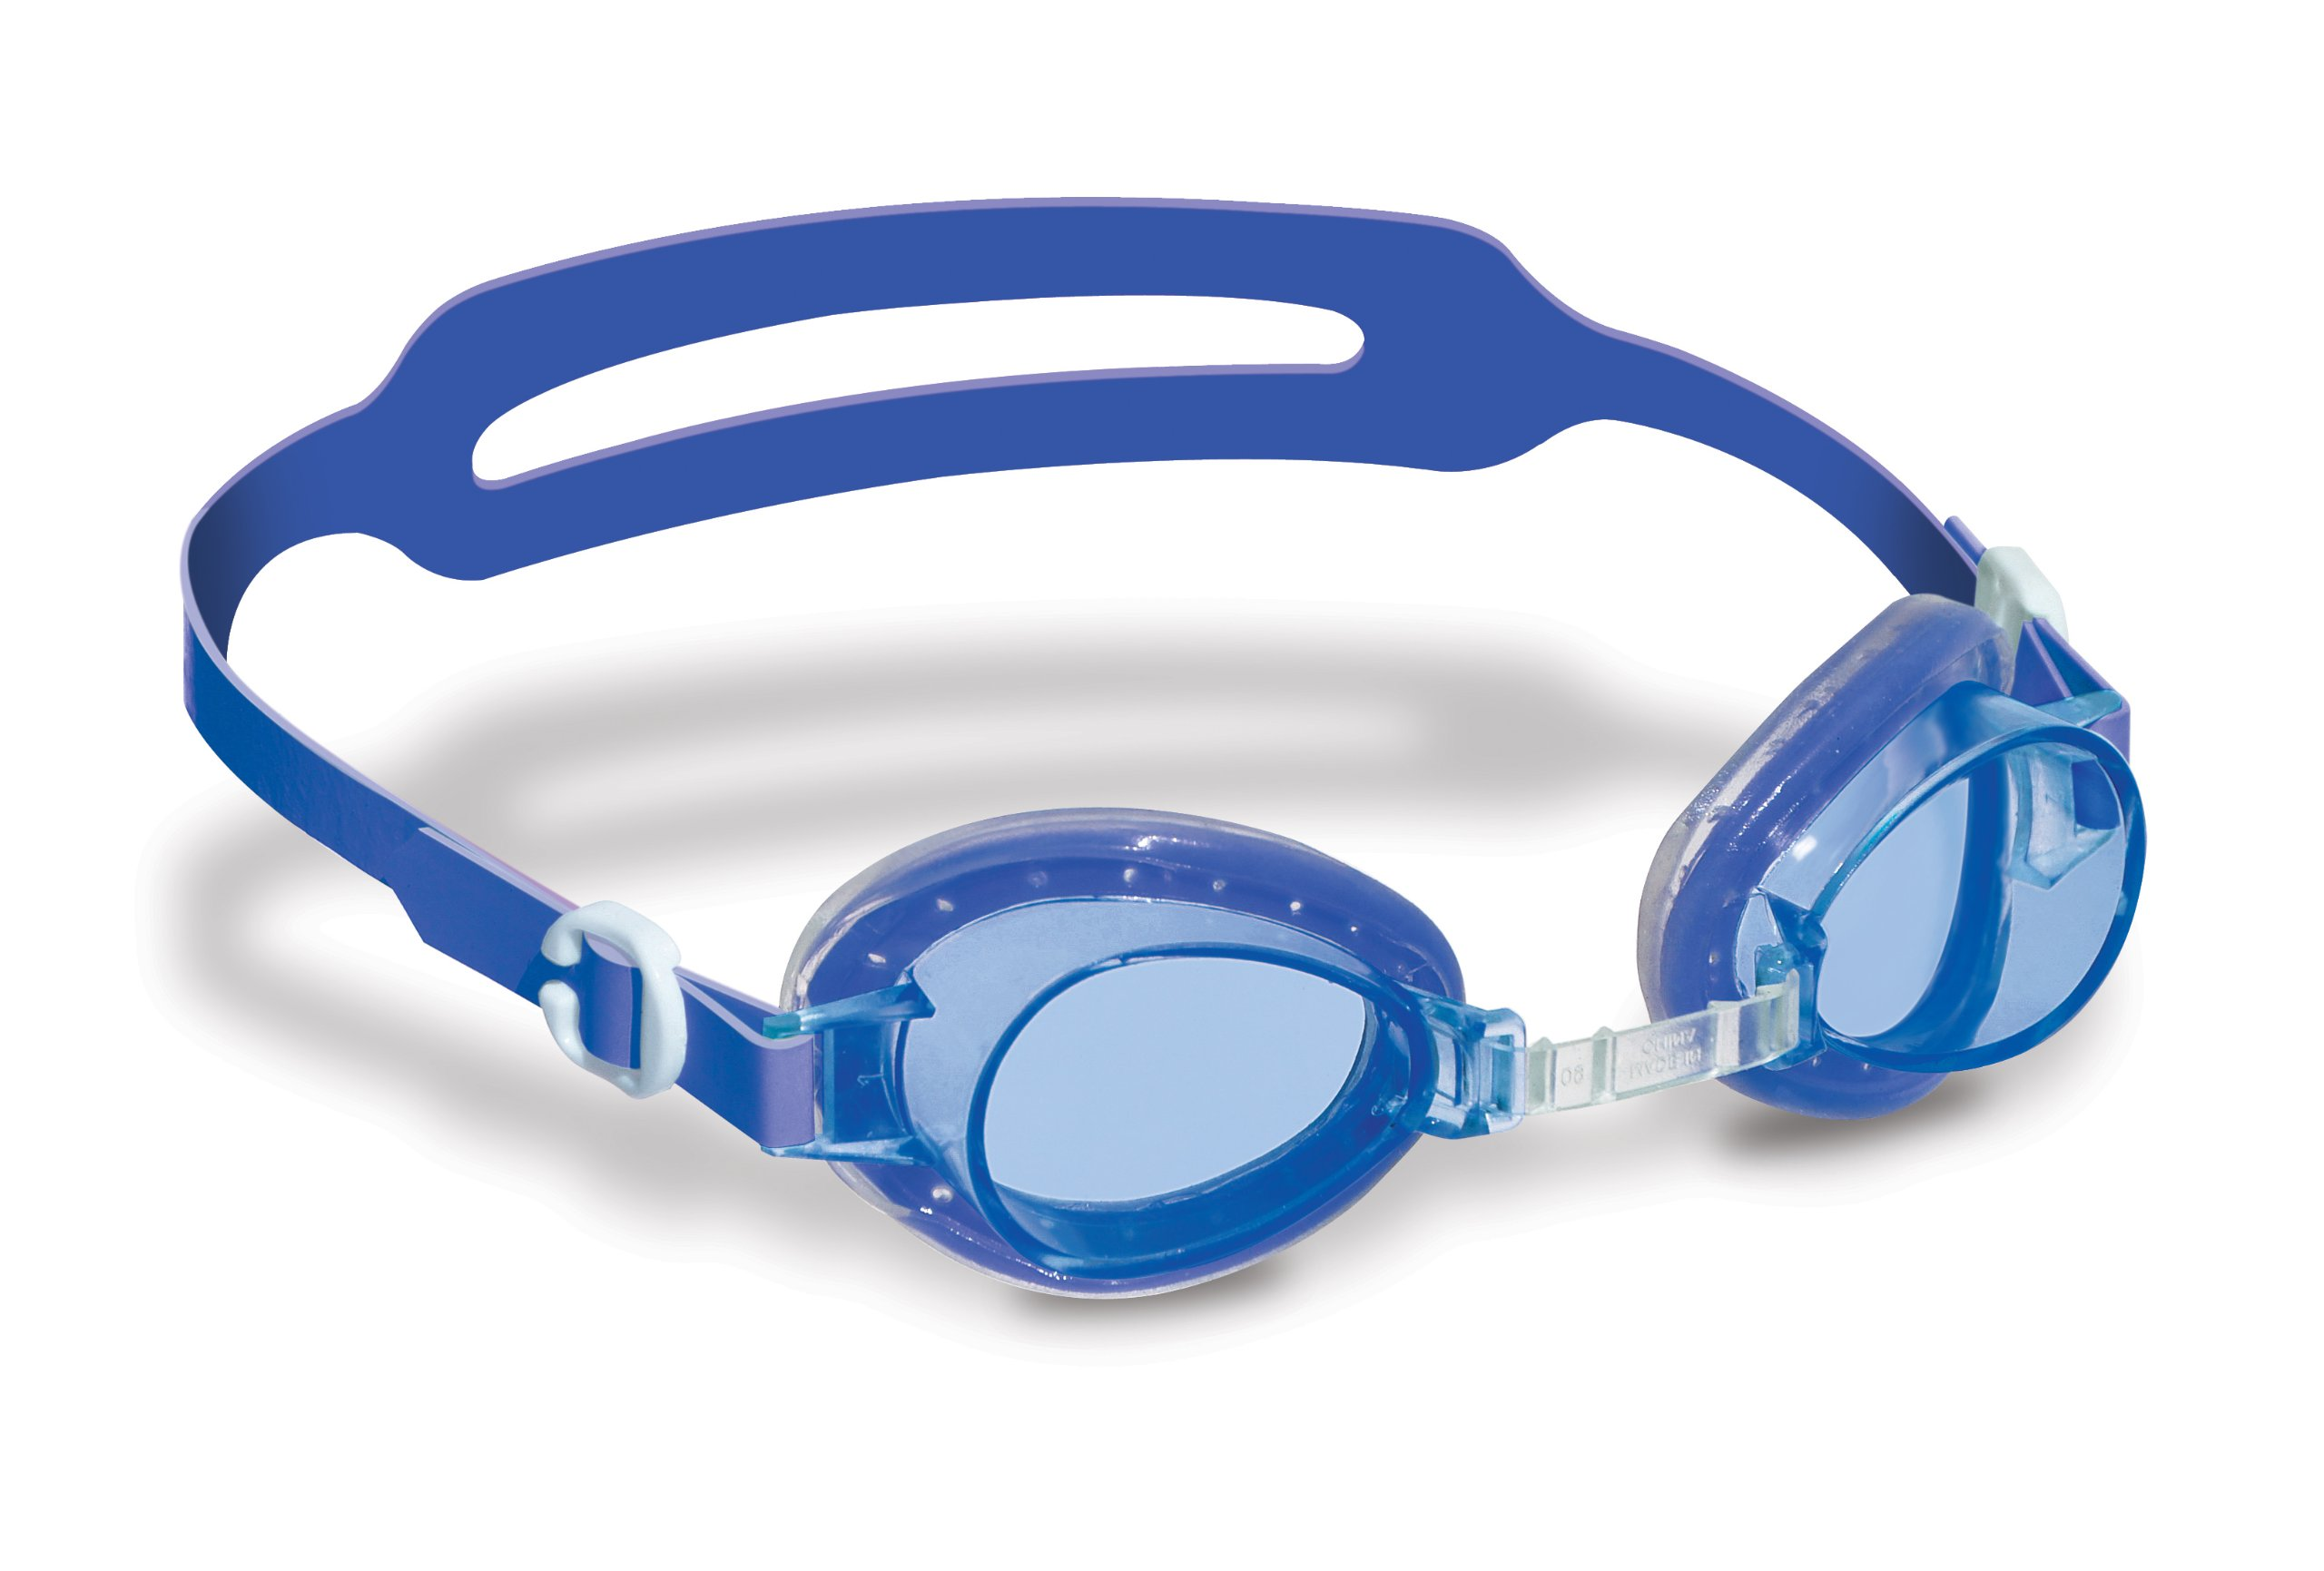 Swimline Aruba Swim Goggle with Case